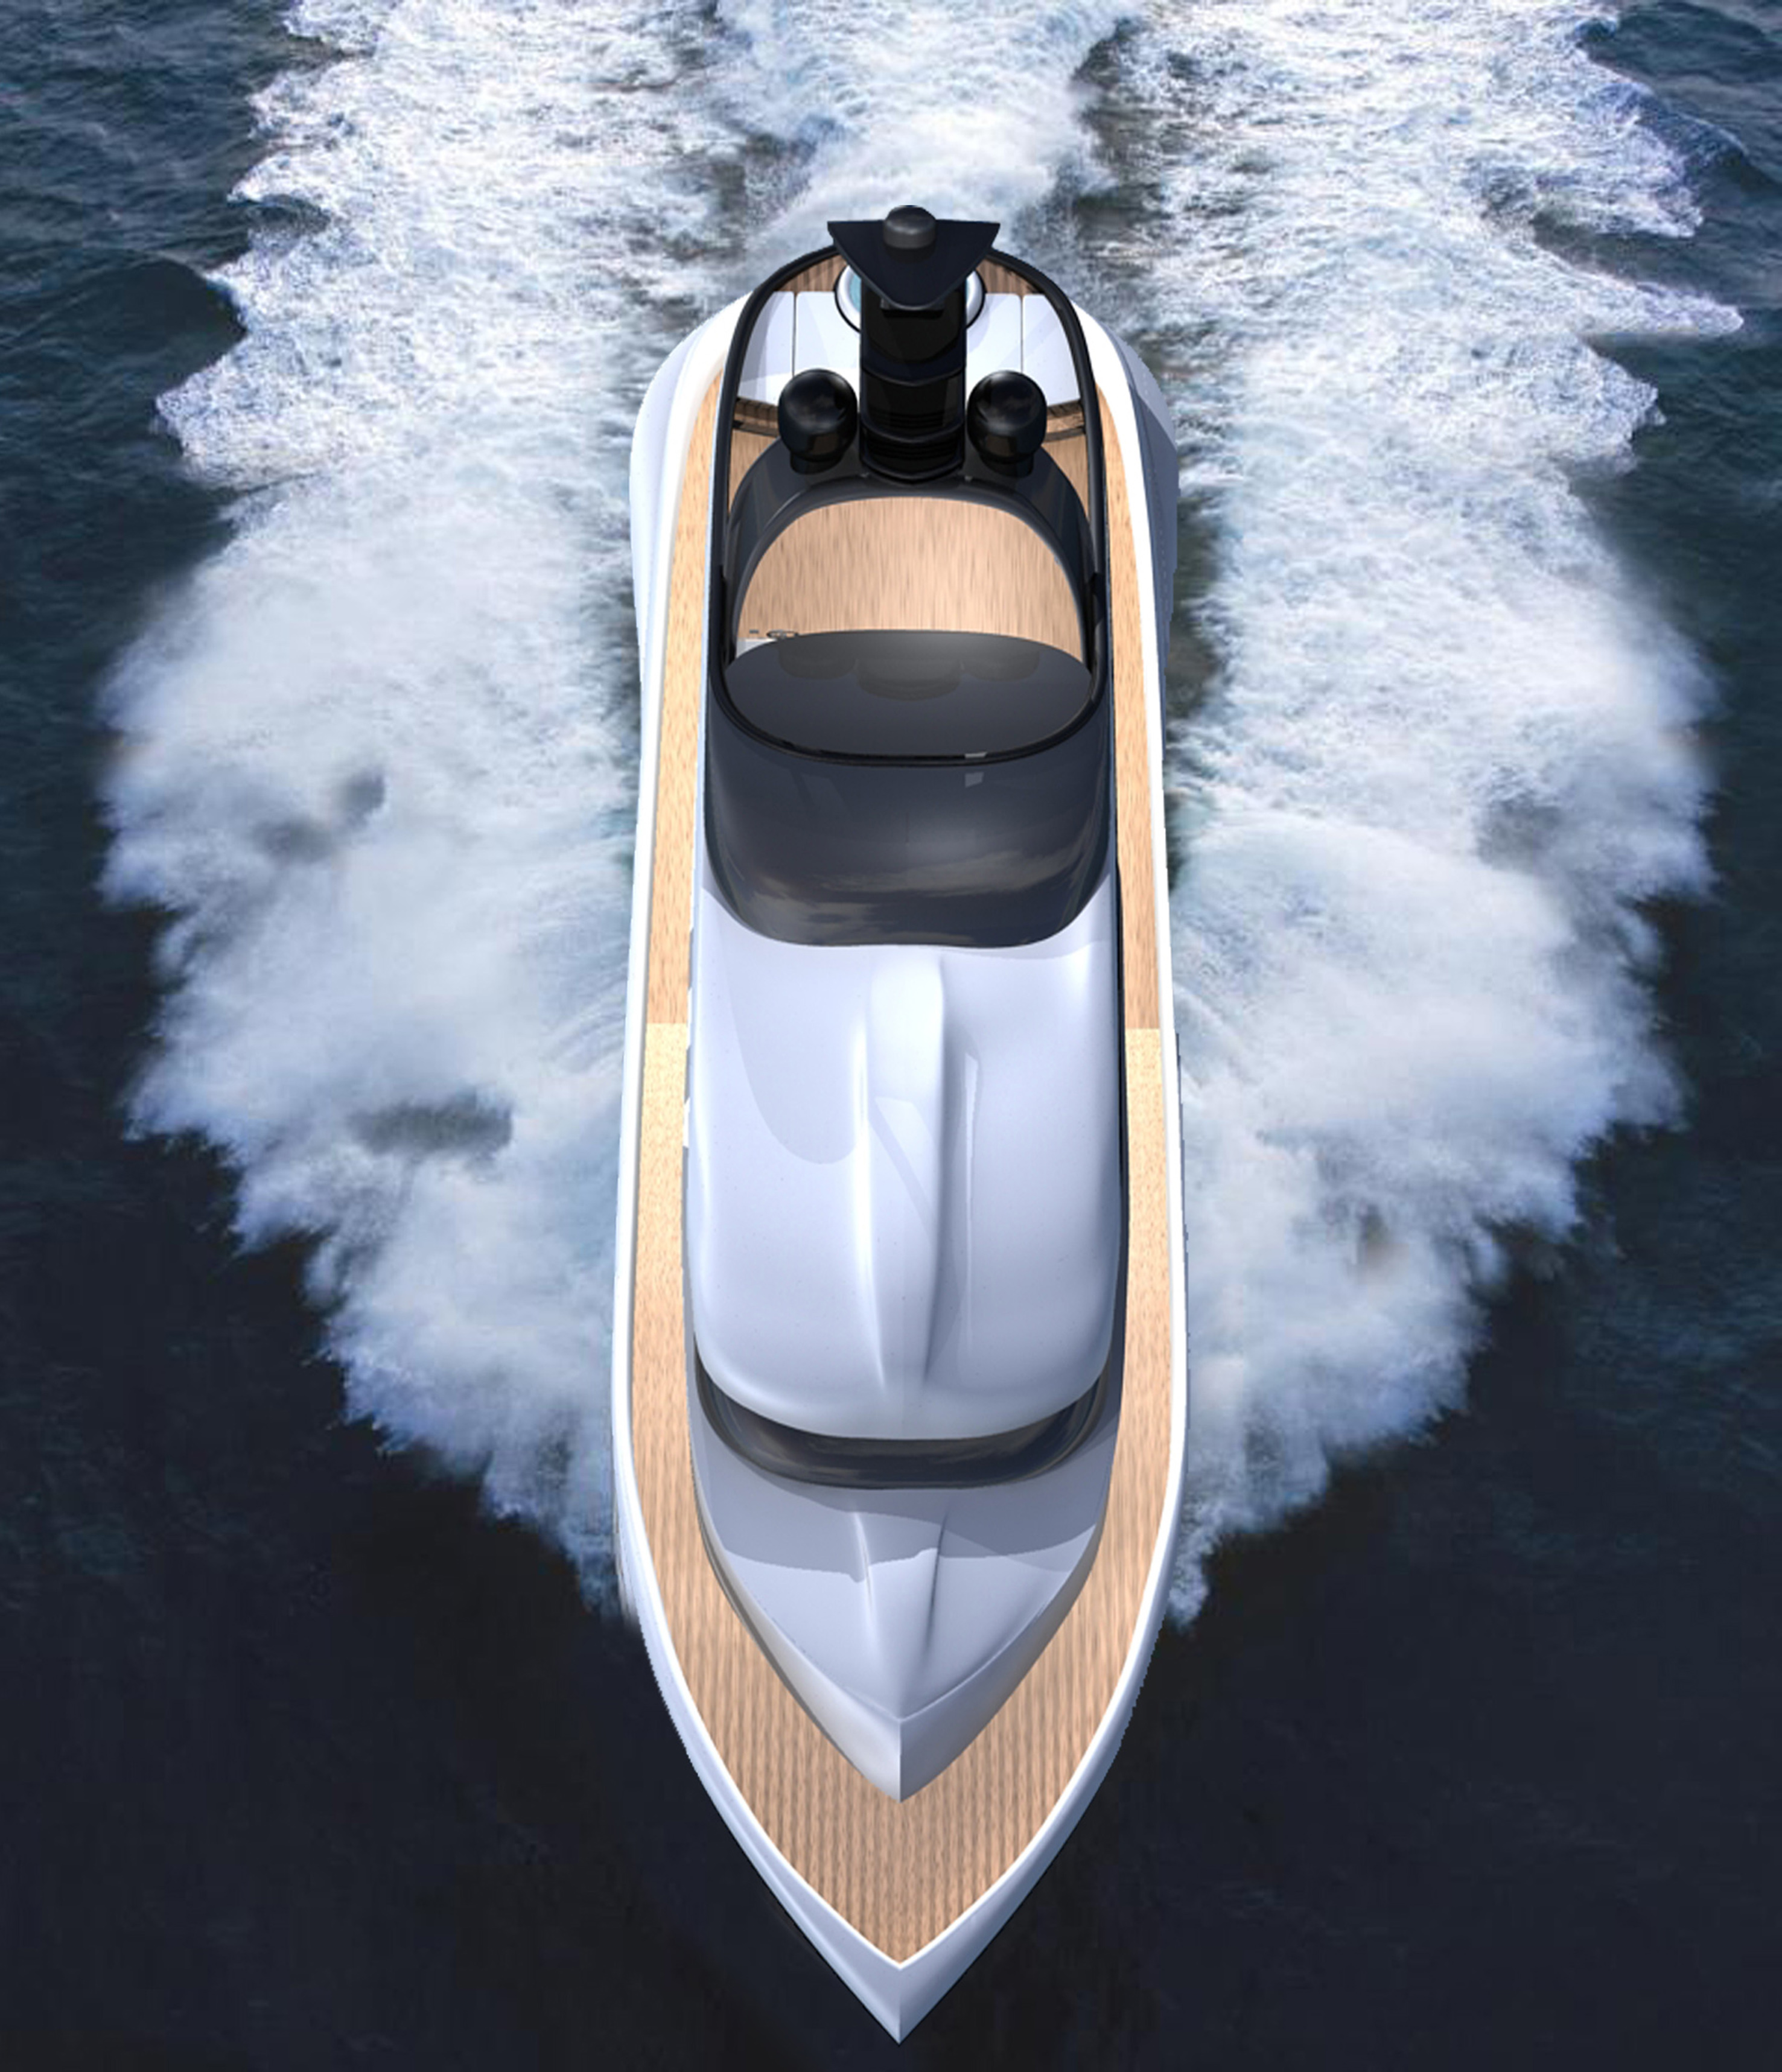 Luxury motor yacht Vento 94